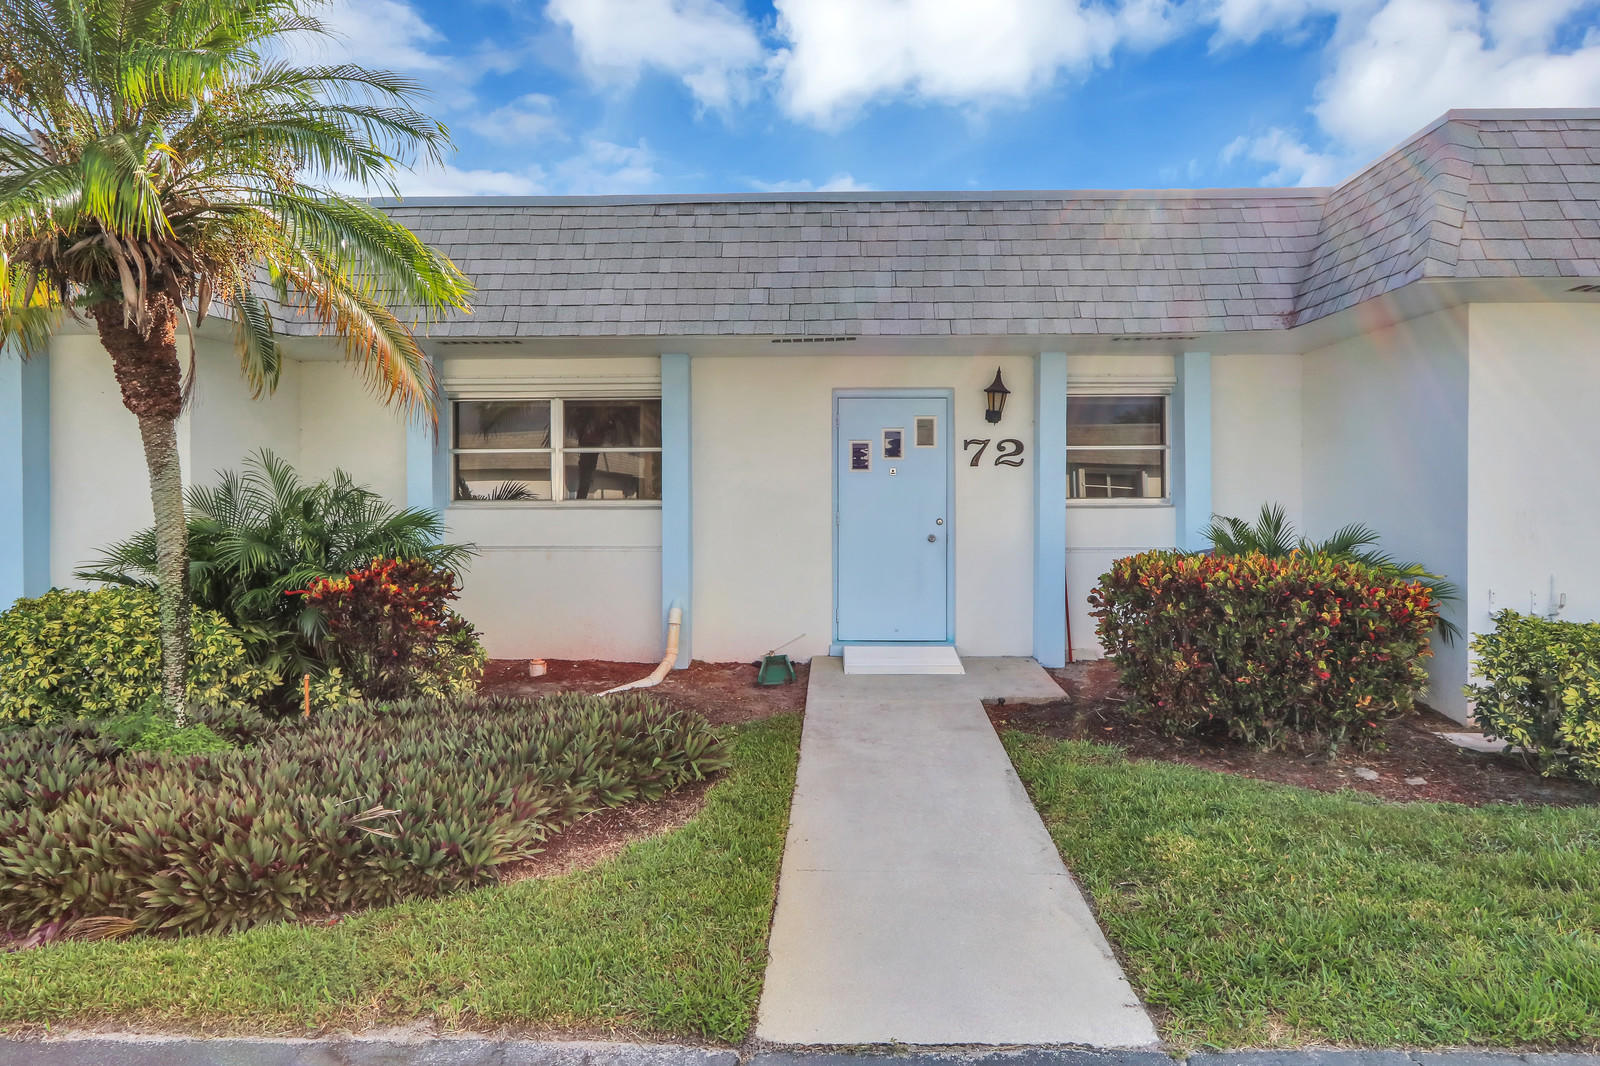 2638 Gately Drive 72 West Palm Beach, FL 33415